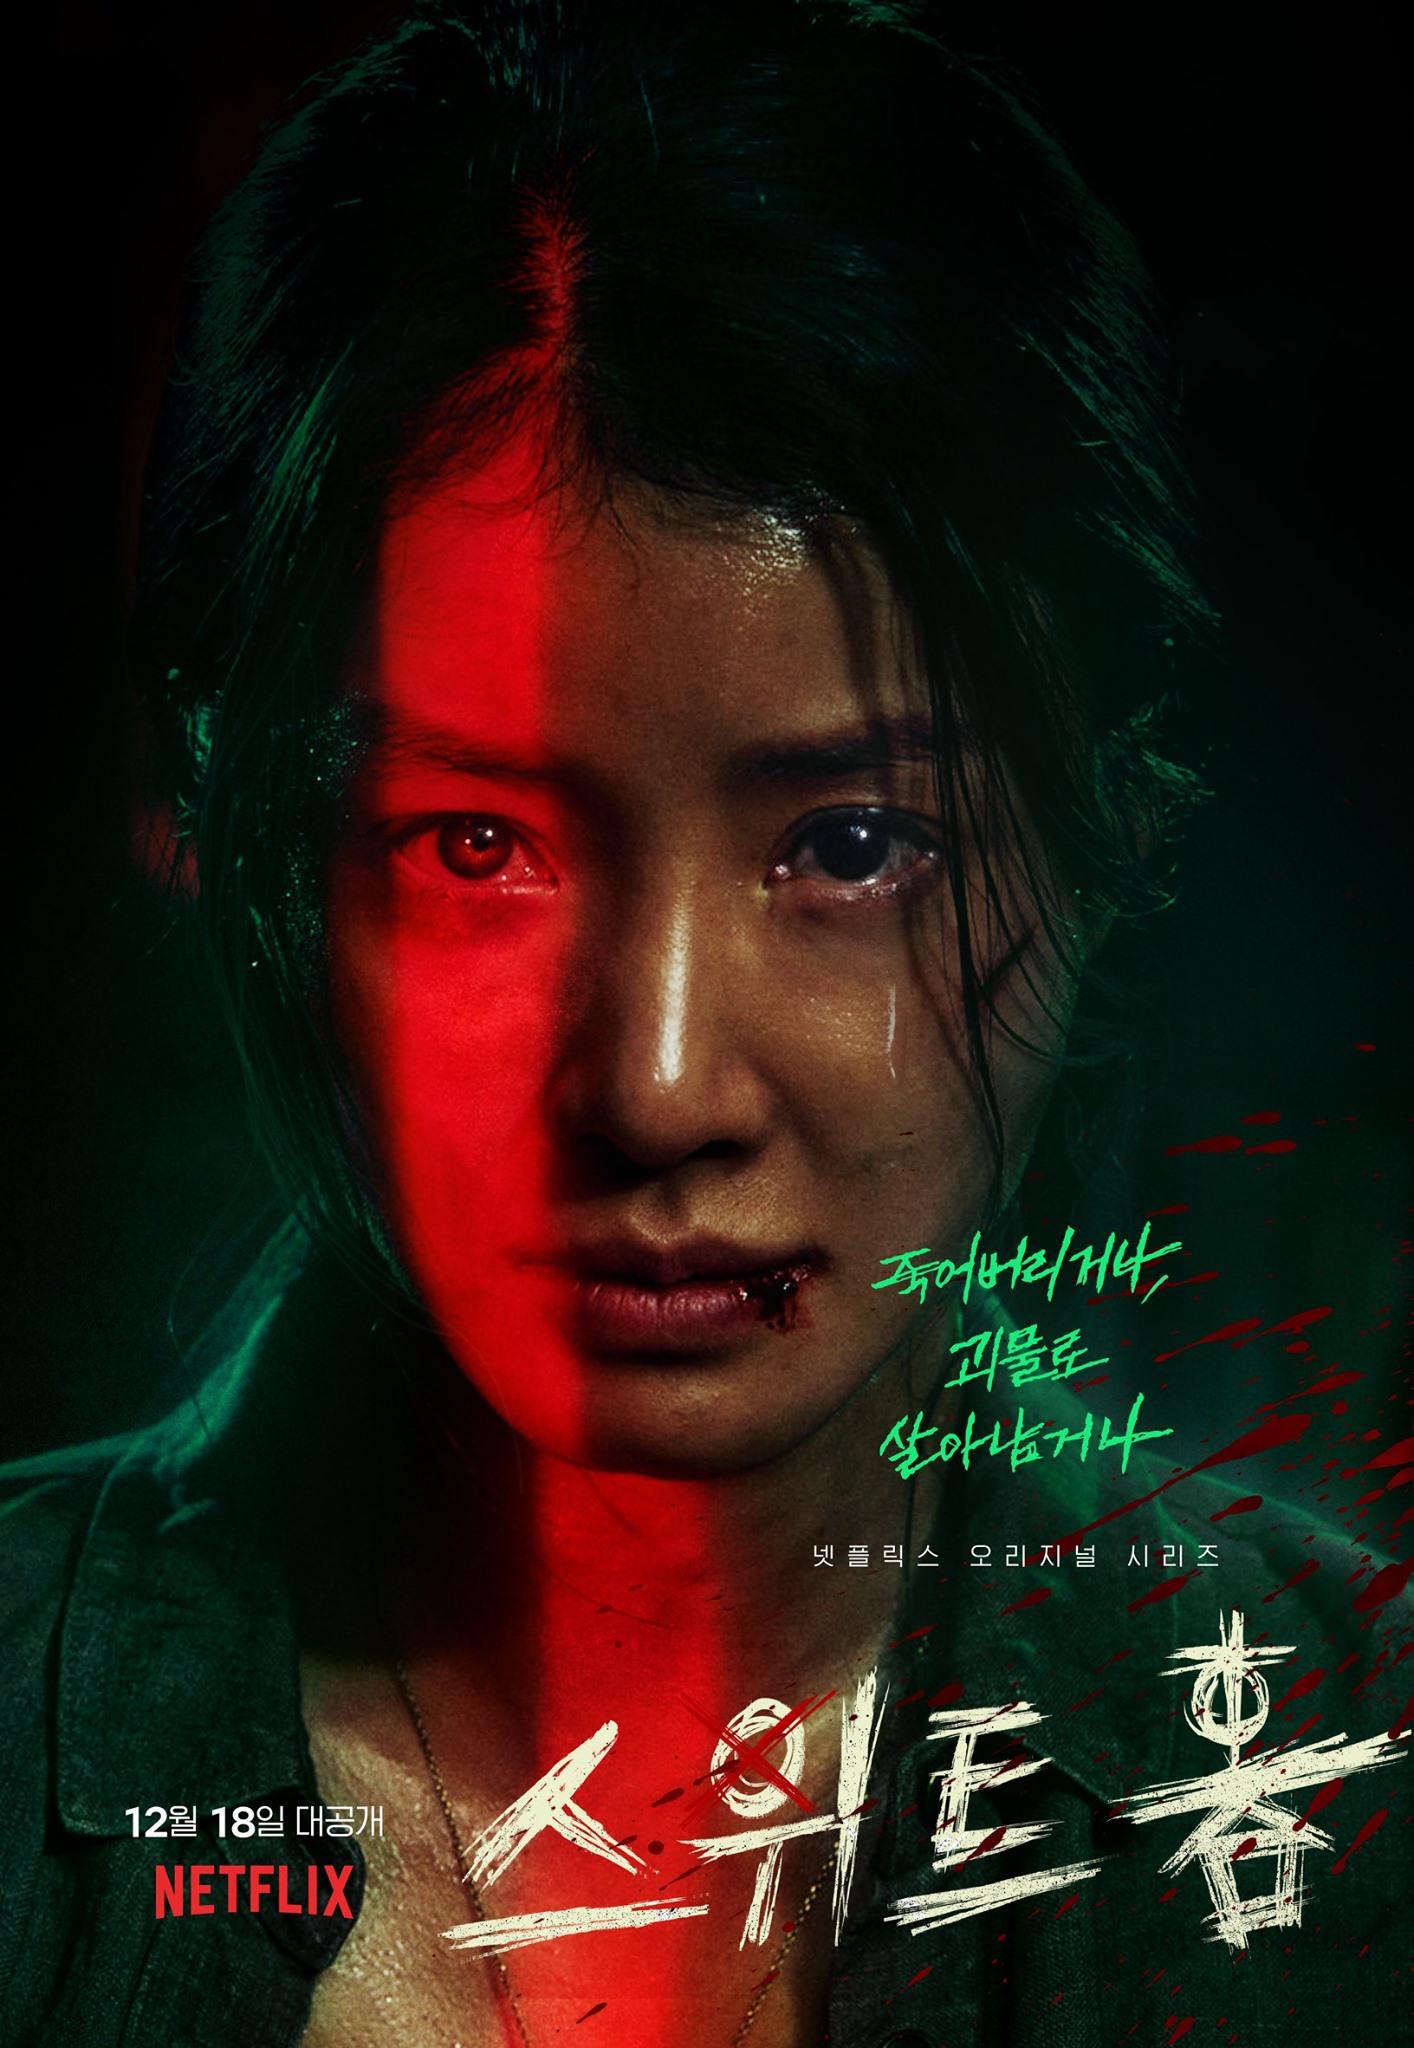 South korea plot synopsis by asianwiki staff © Sweet Home 2020 Netflix Drama Cast Summary Kpopmap